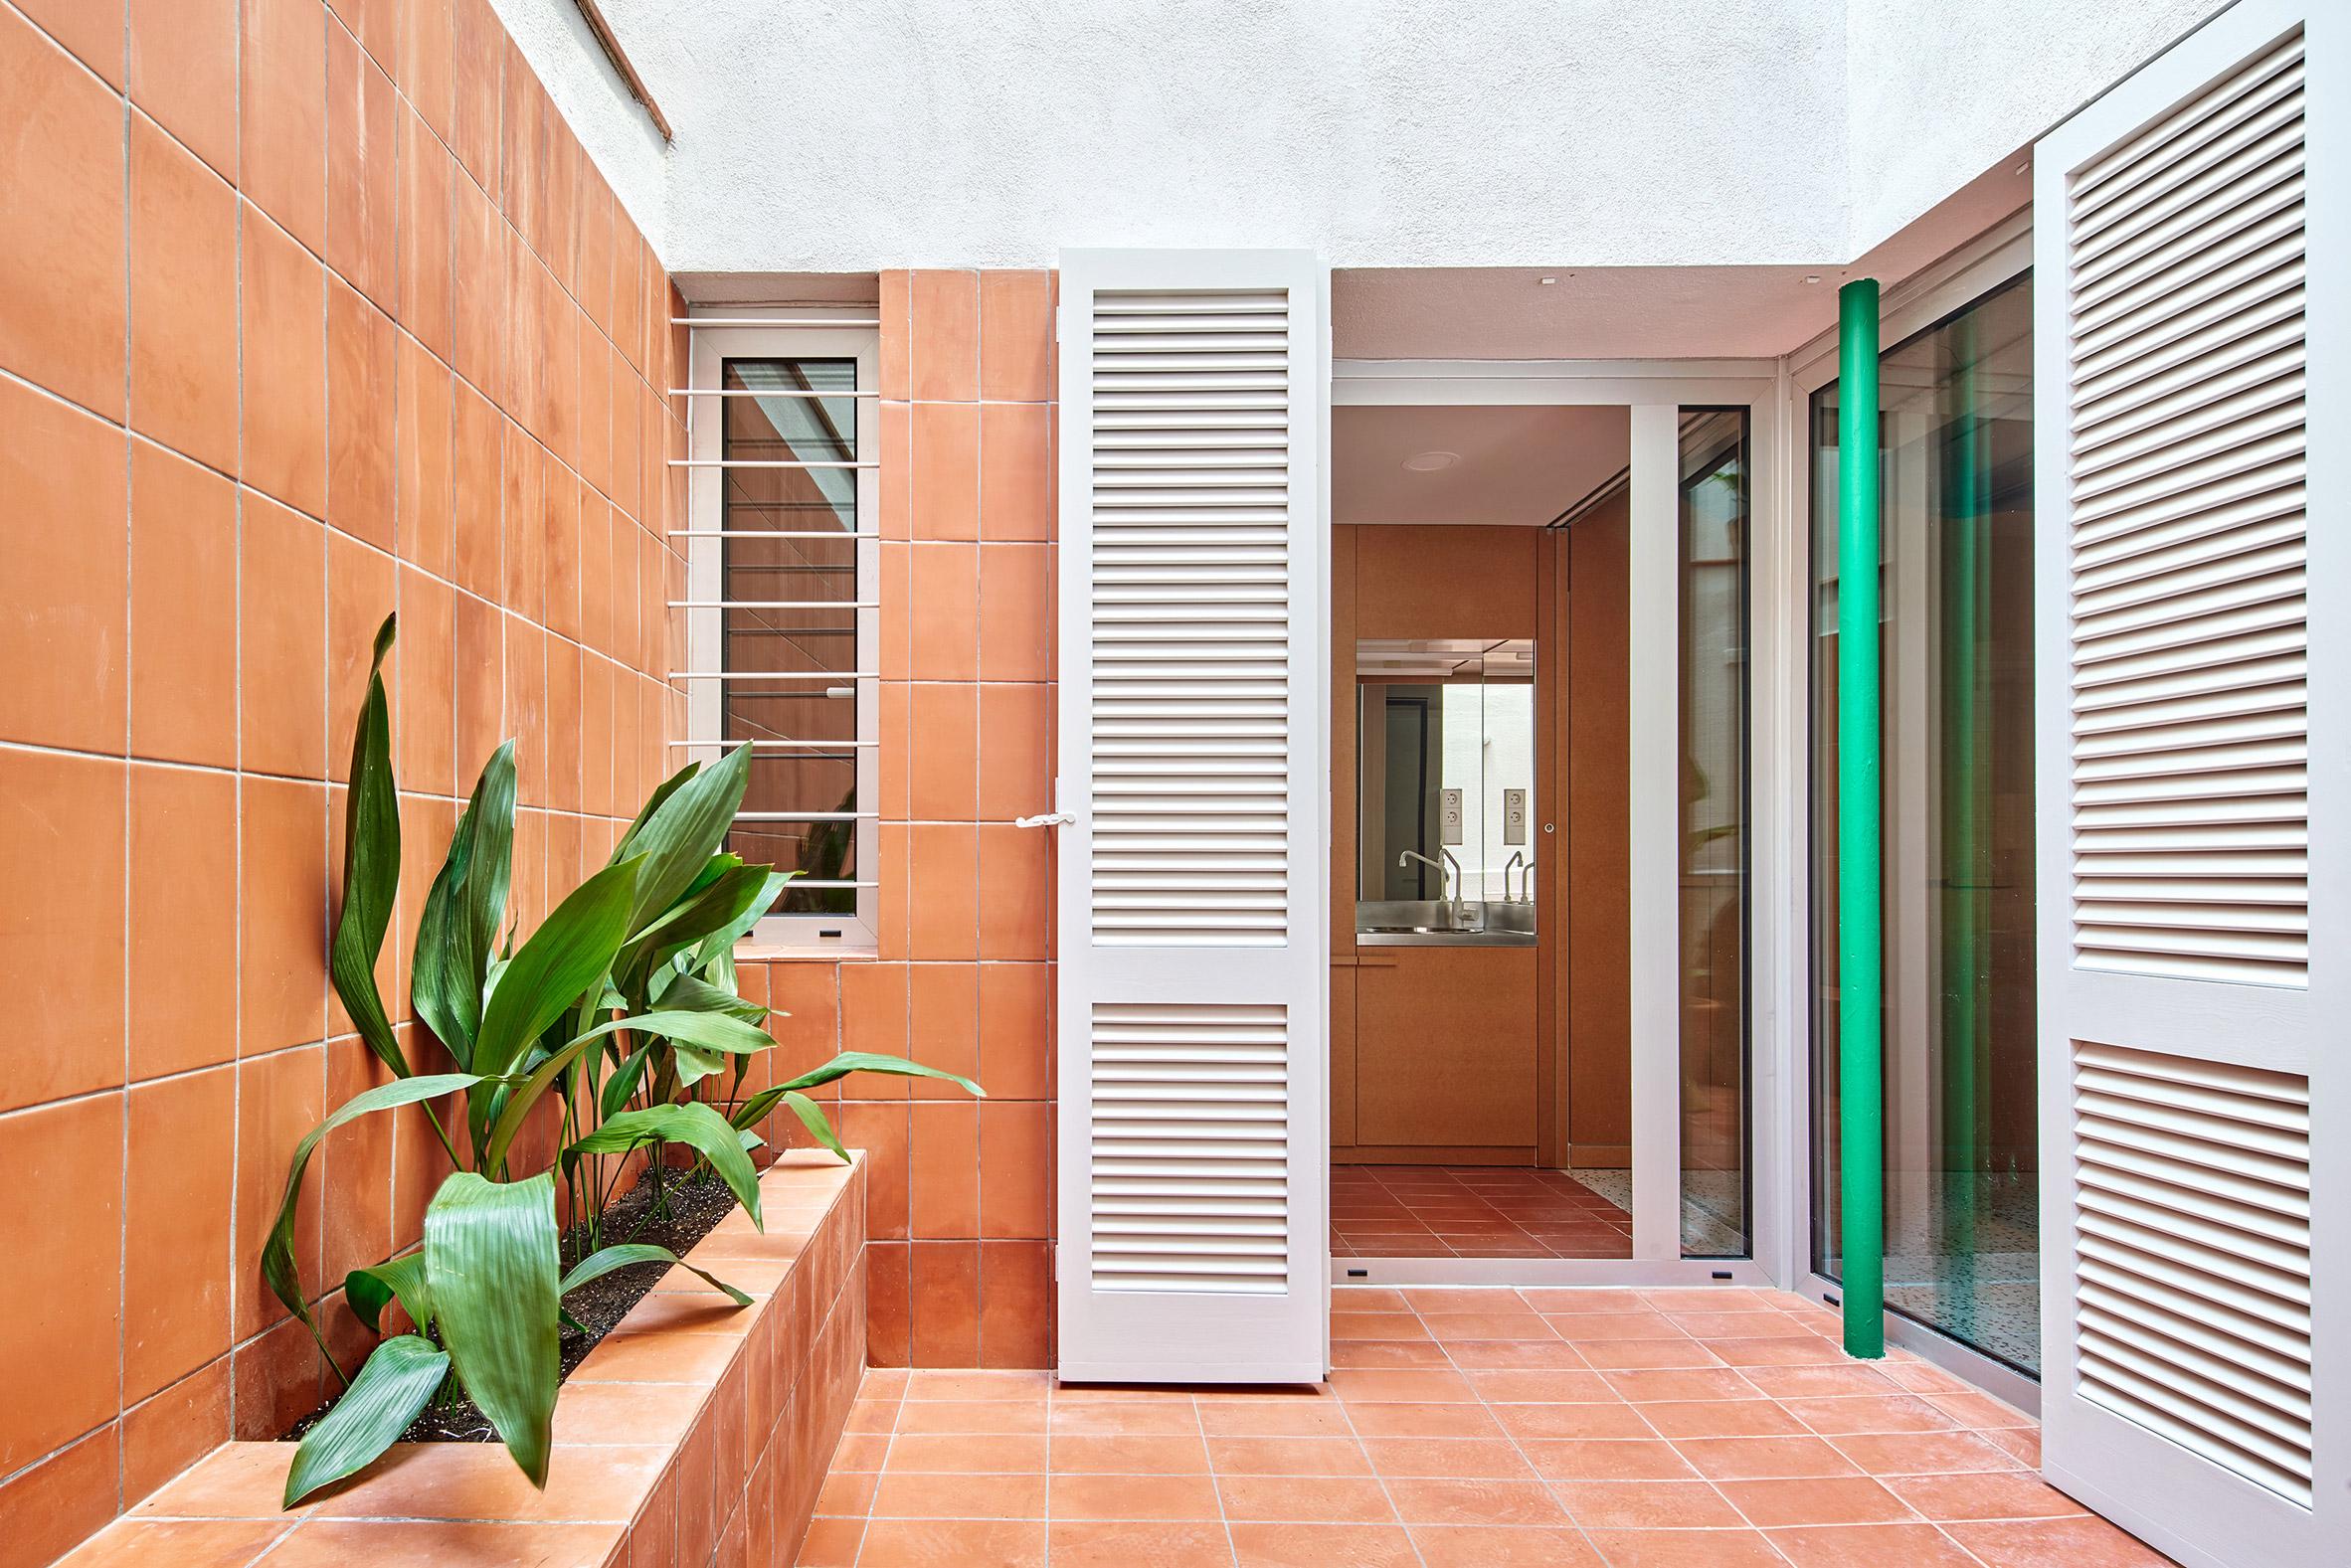 El Guateque apartments by Adrià Escolano and David Steegmann